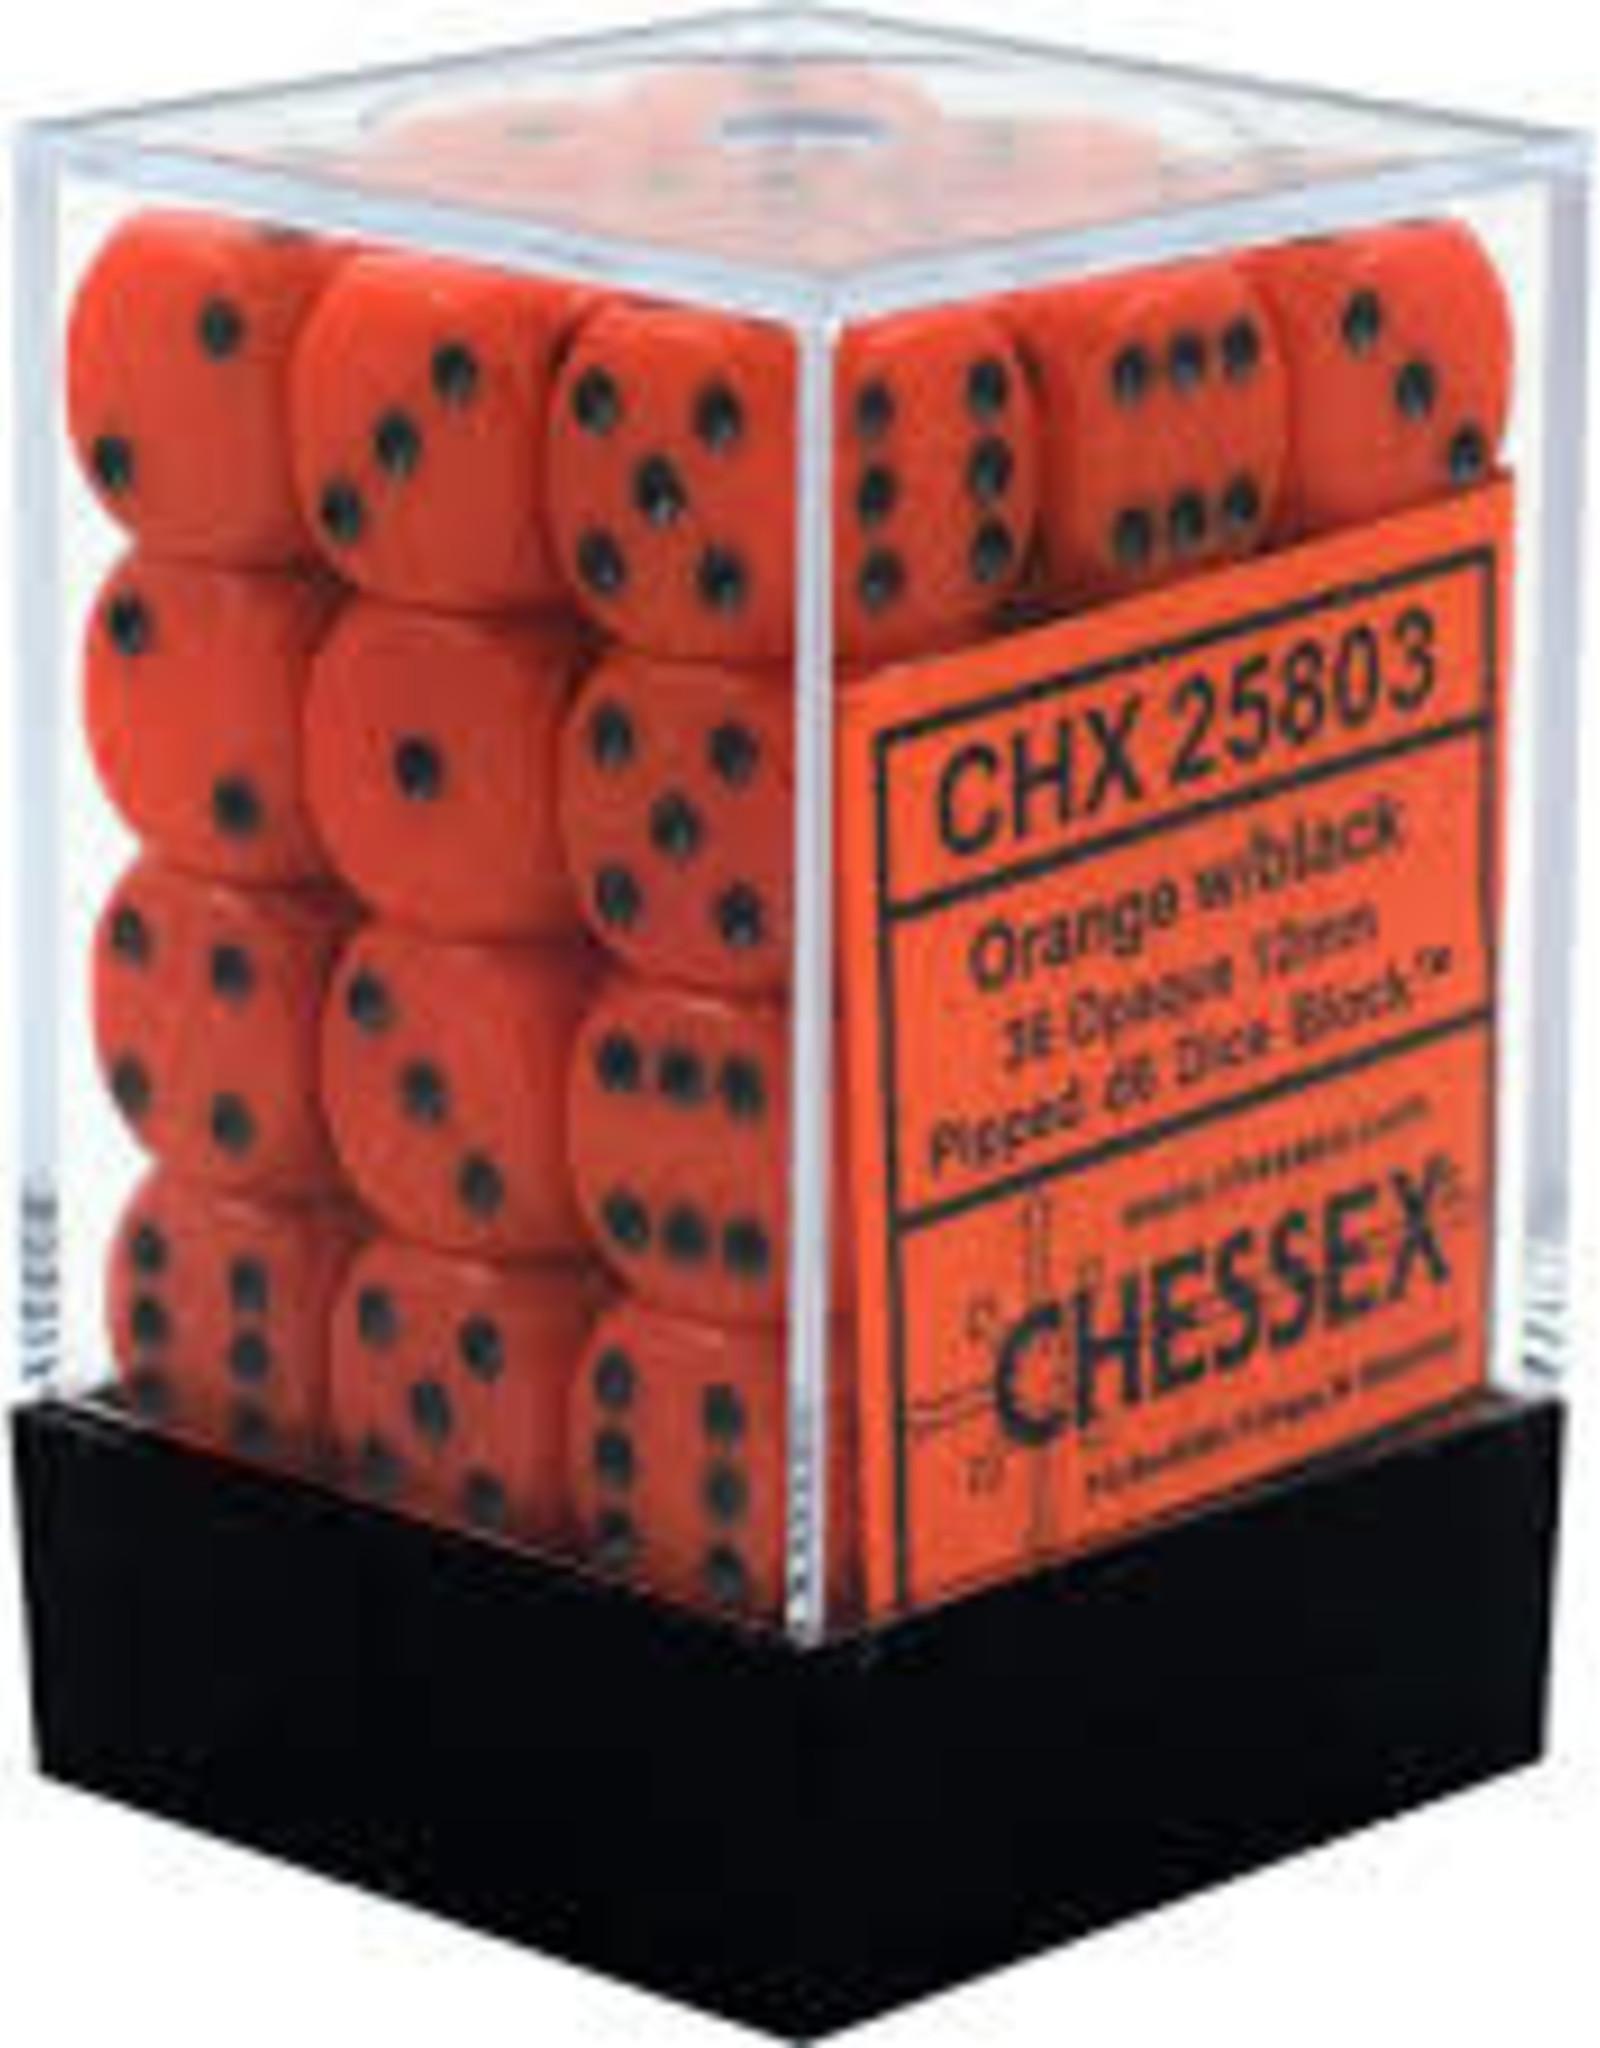 Chessex Chessex Opaque Orange w/ Black 12mm (Small) 36 Dice Set CHX25803